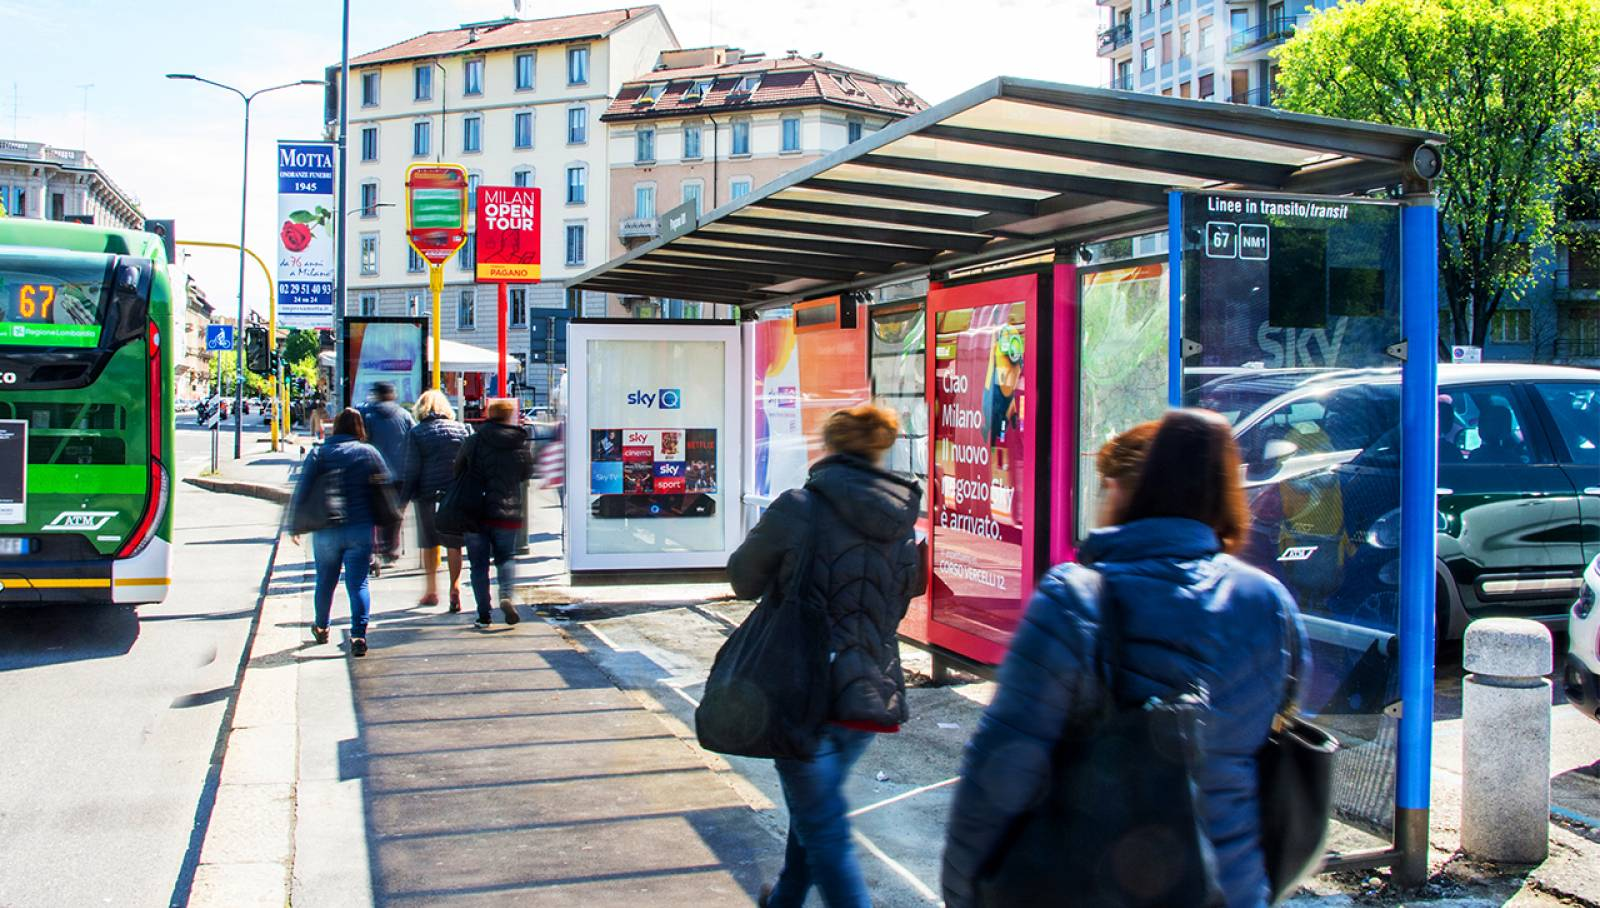 OOH Advertising Milano Brand Pensiline Creative Solutions IGPDecaux per SKY Italia